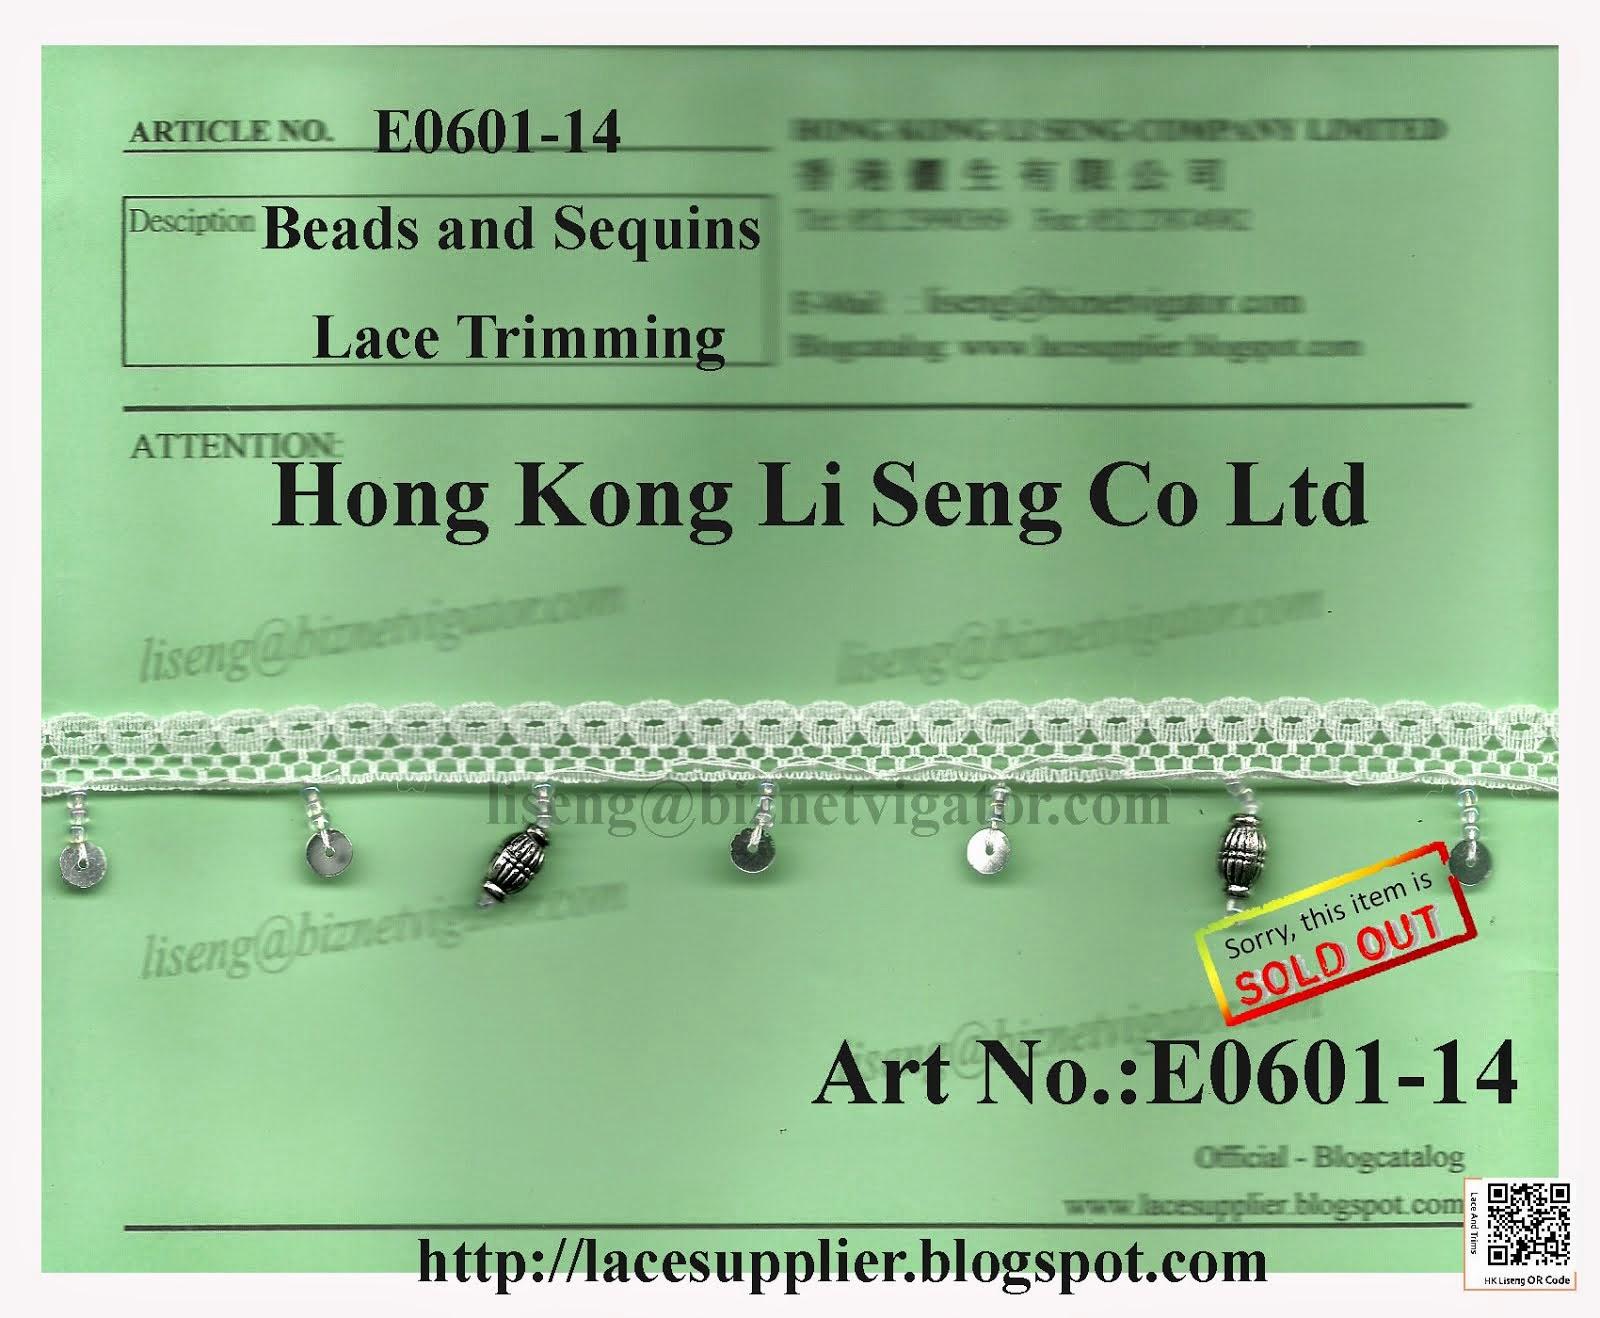 Beads and Sequins Lace Trimming Supplier - Hong Kong Li Seng Co Ltd